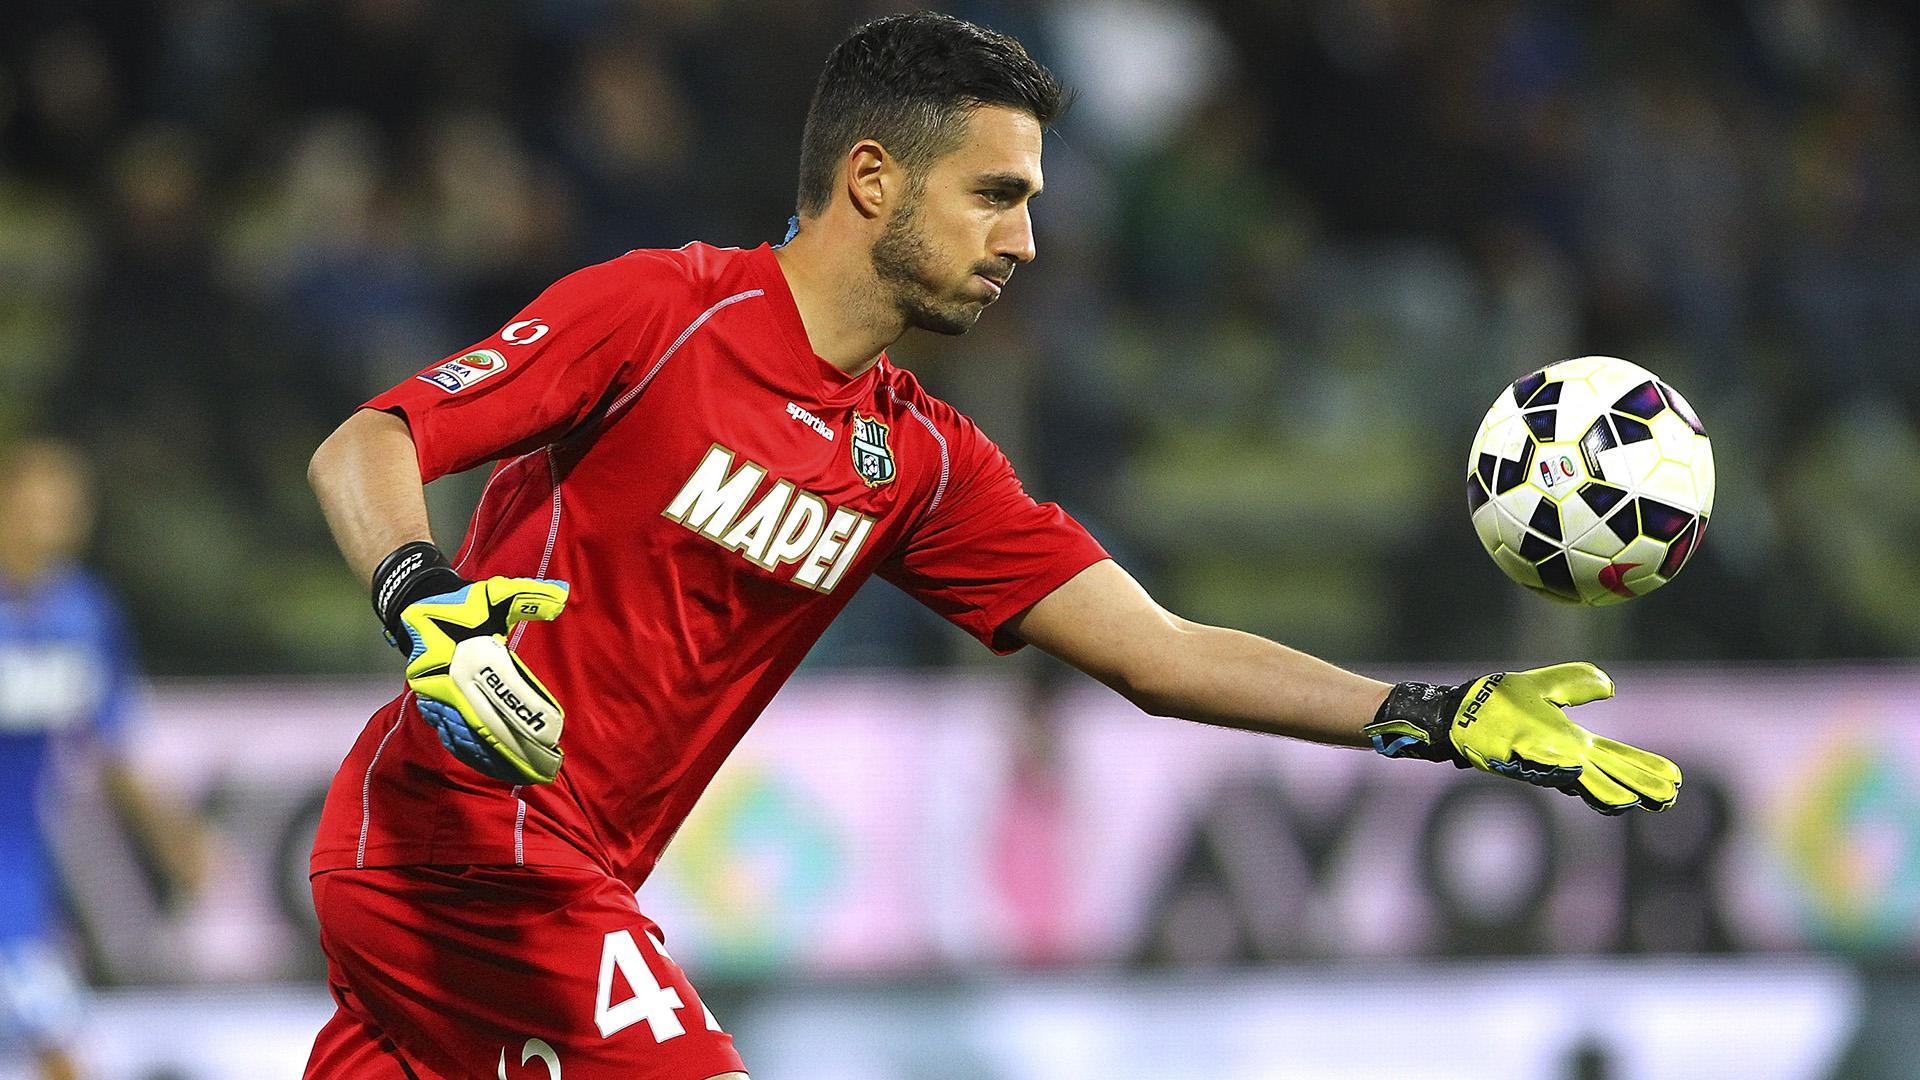 Parma FC v US Sassuolo – Serie A